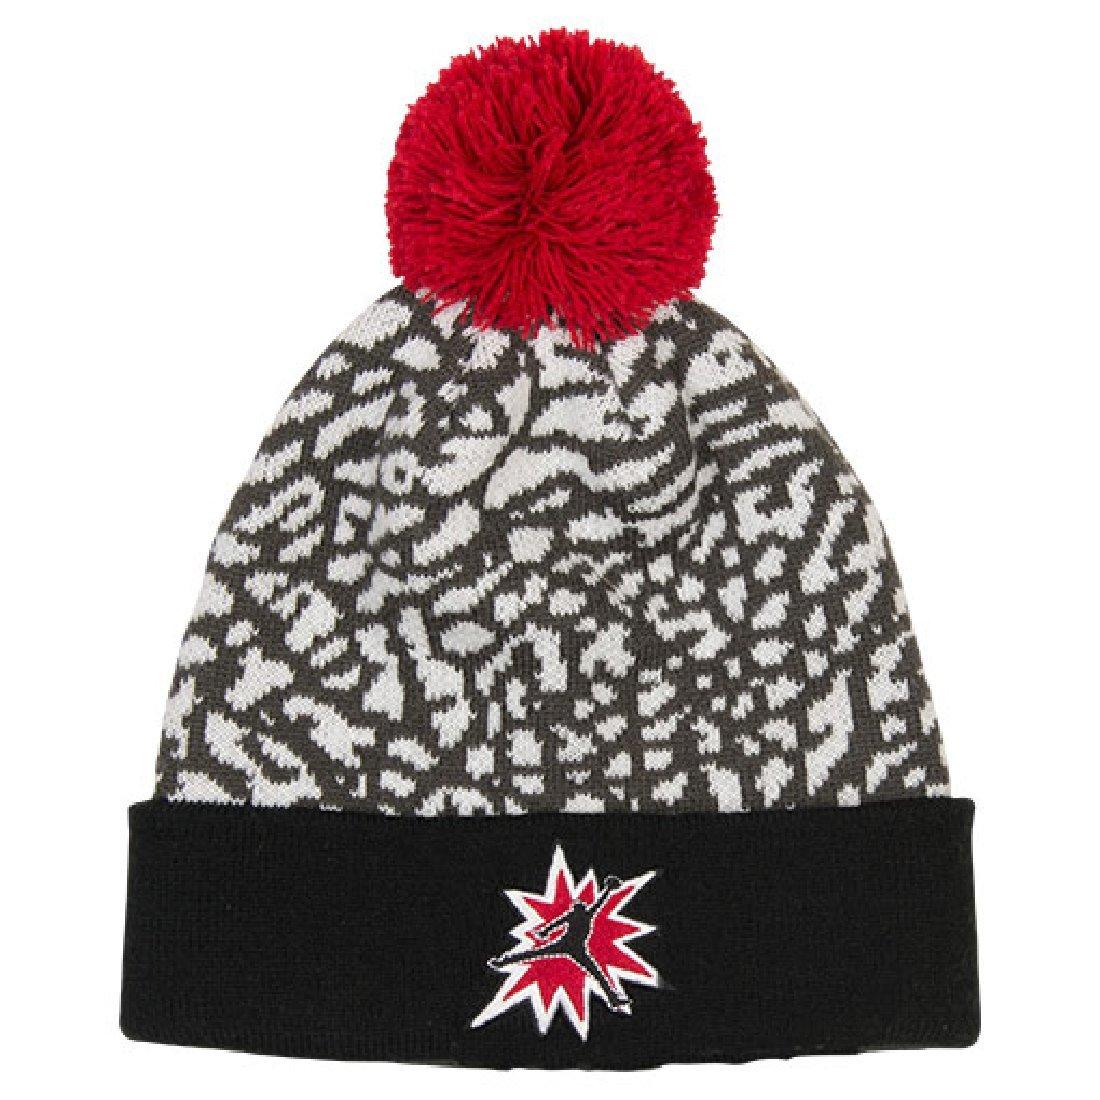 Boy's Jordan 5 Pom Beanie Hat 8/20